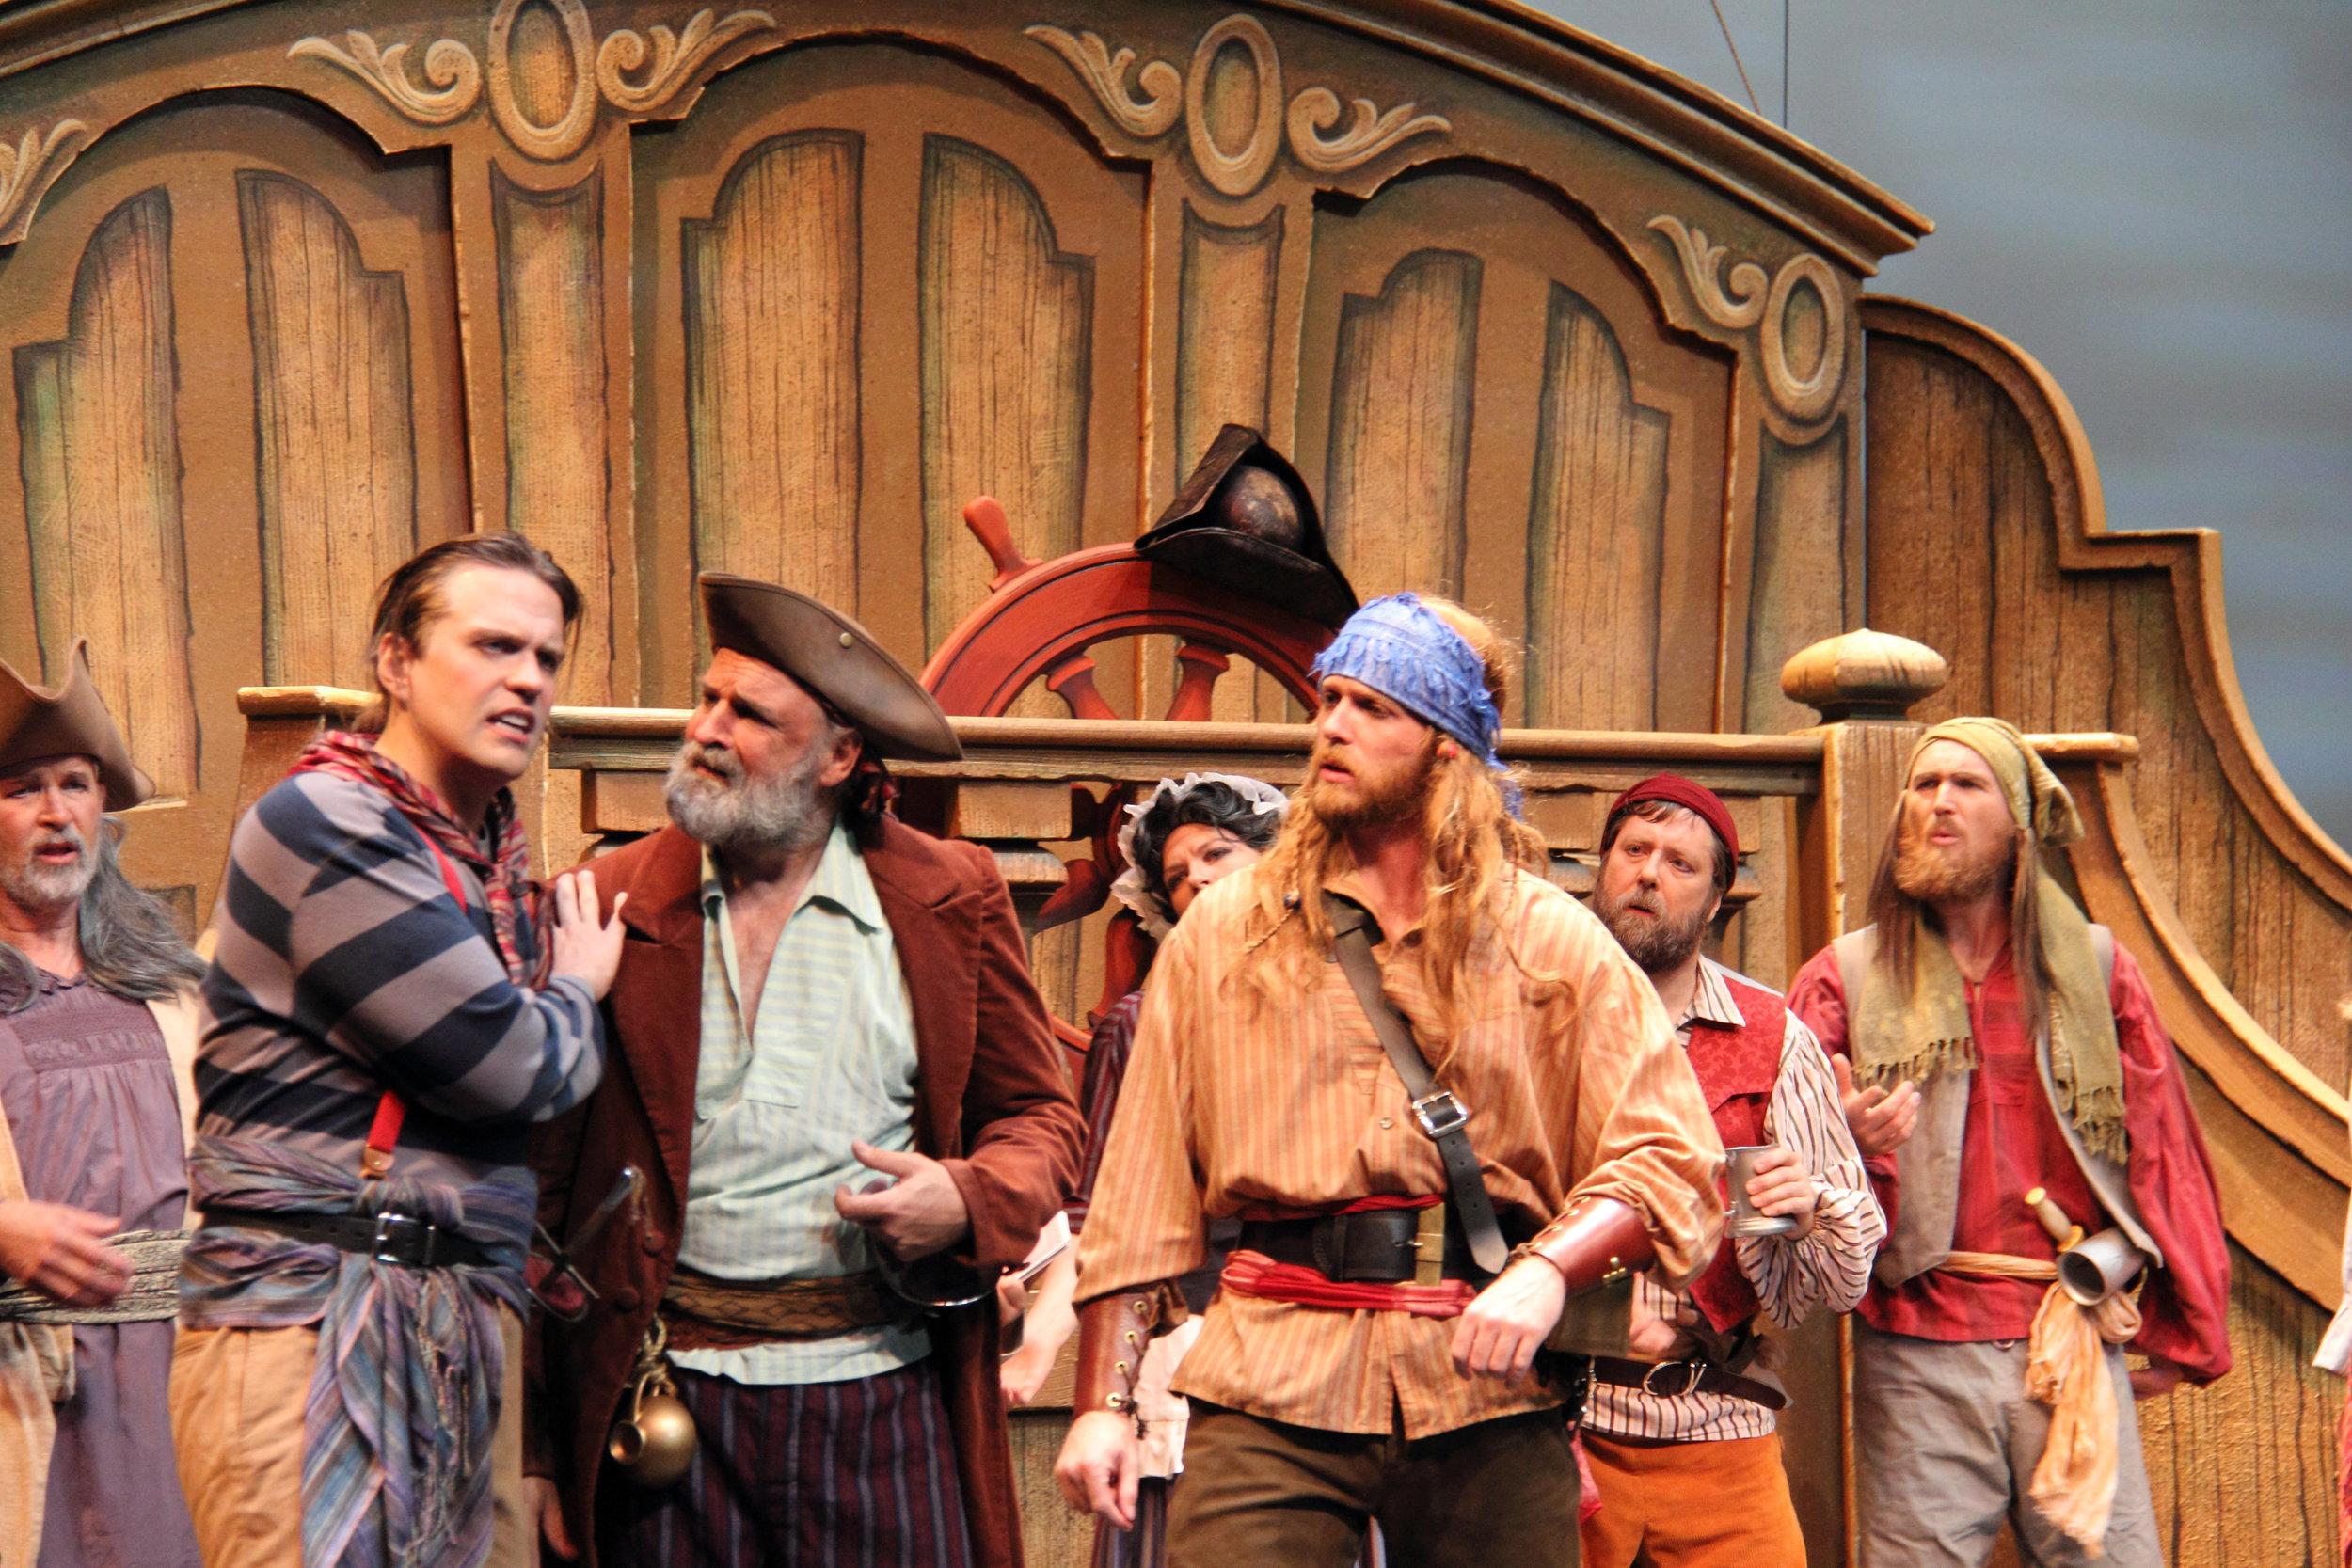 Pirates-15-photos9.JPG